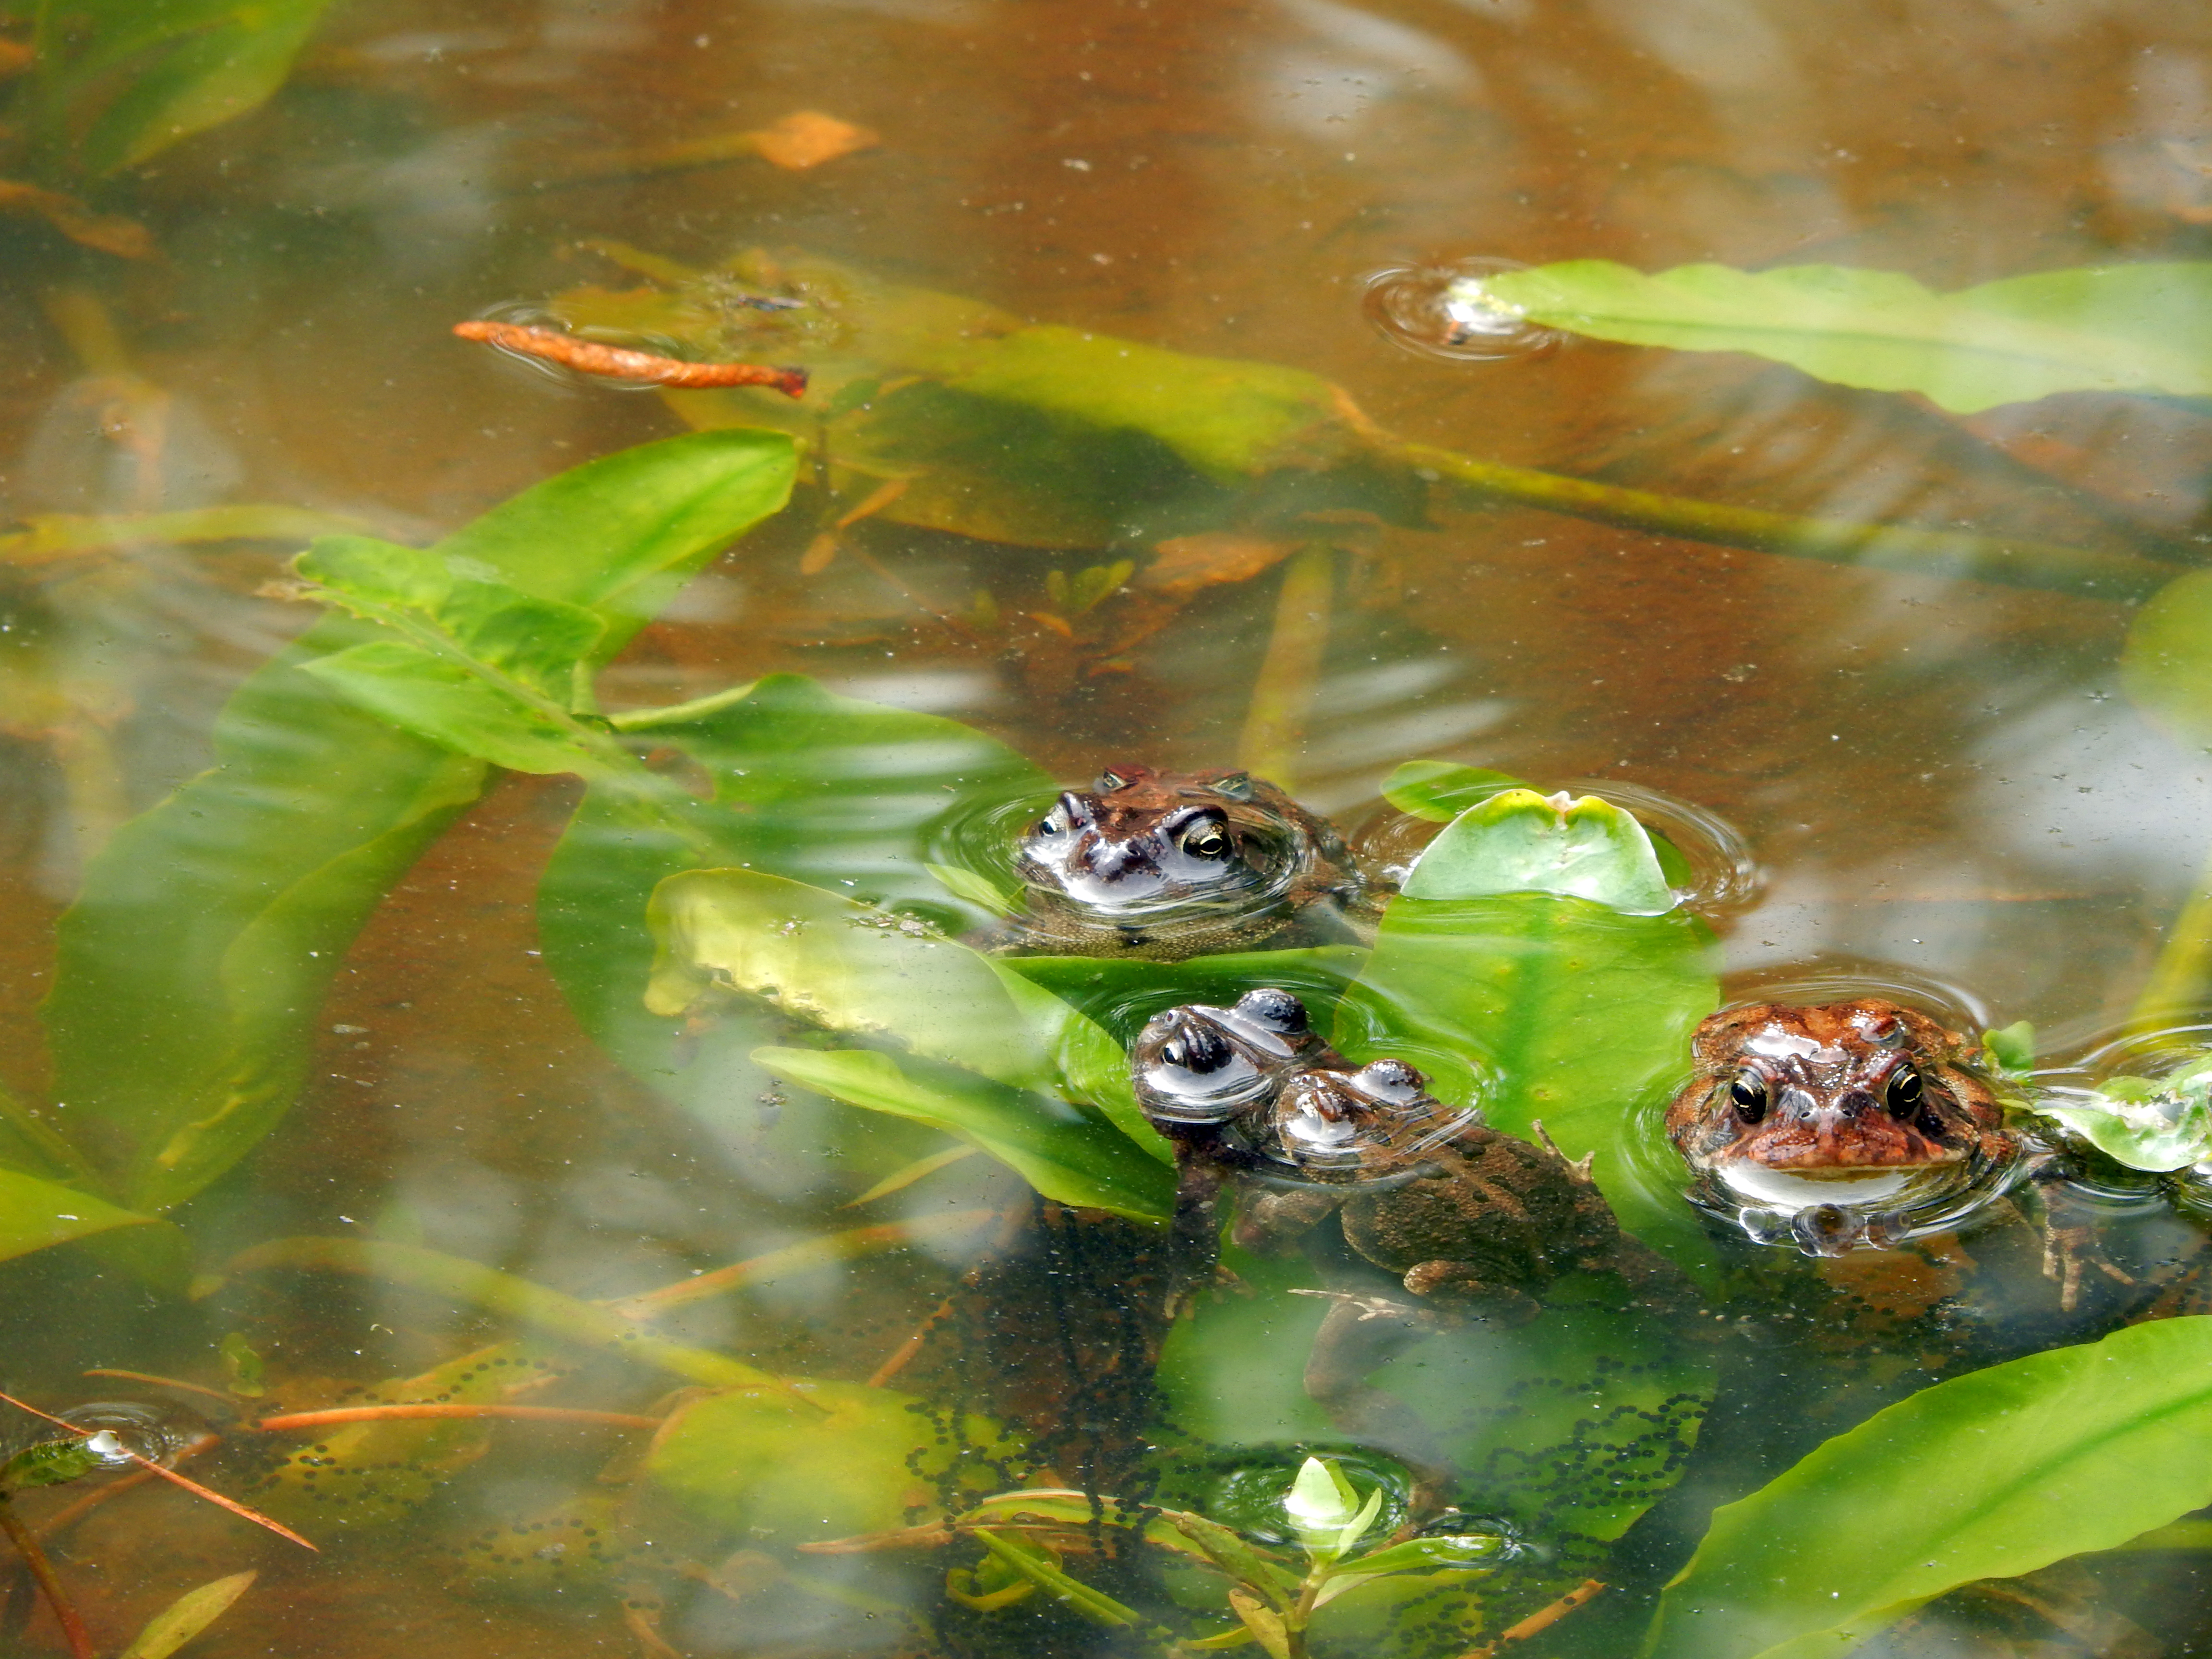 Amphibians southern toads breeding Mazarick Park ncwetlands KG (2), Cypress swamp, North Carolina Wetland, North Carolina Wetlands, Water, HQ Photo